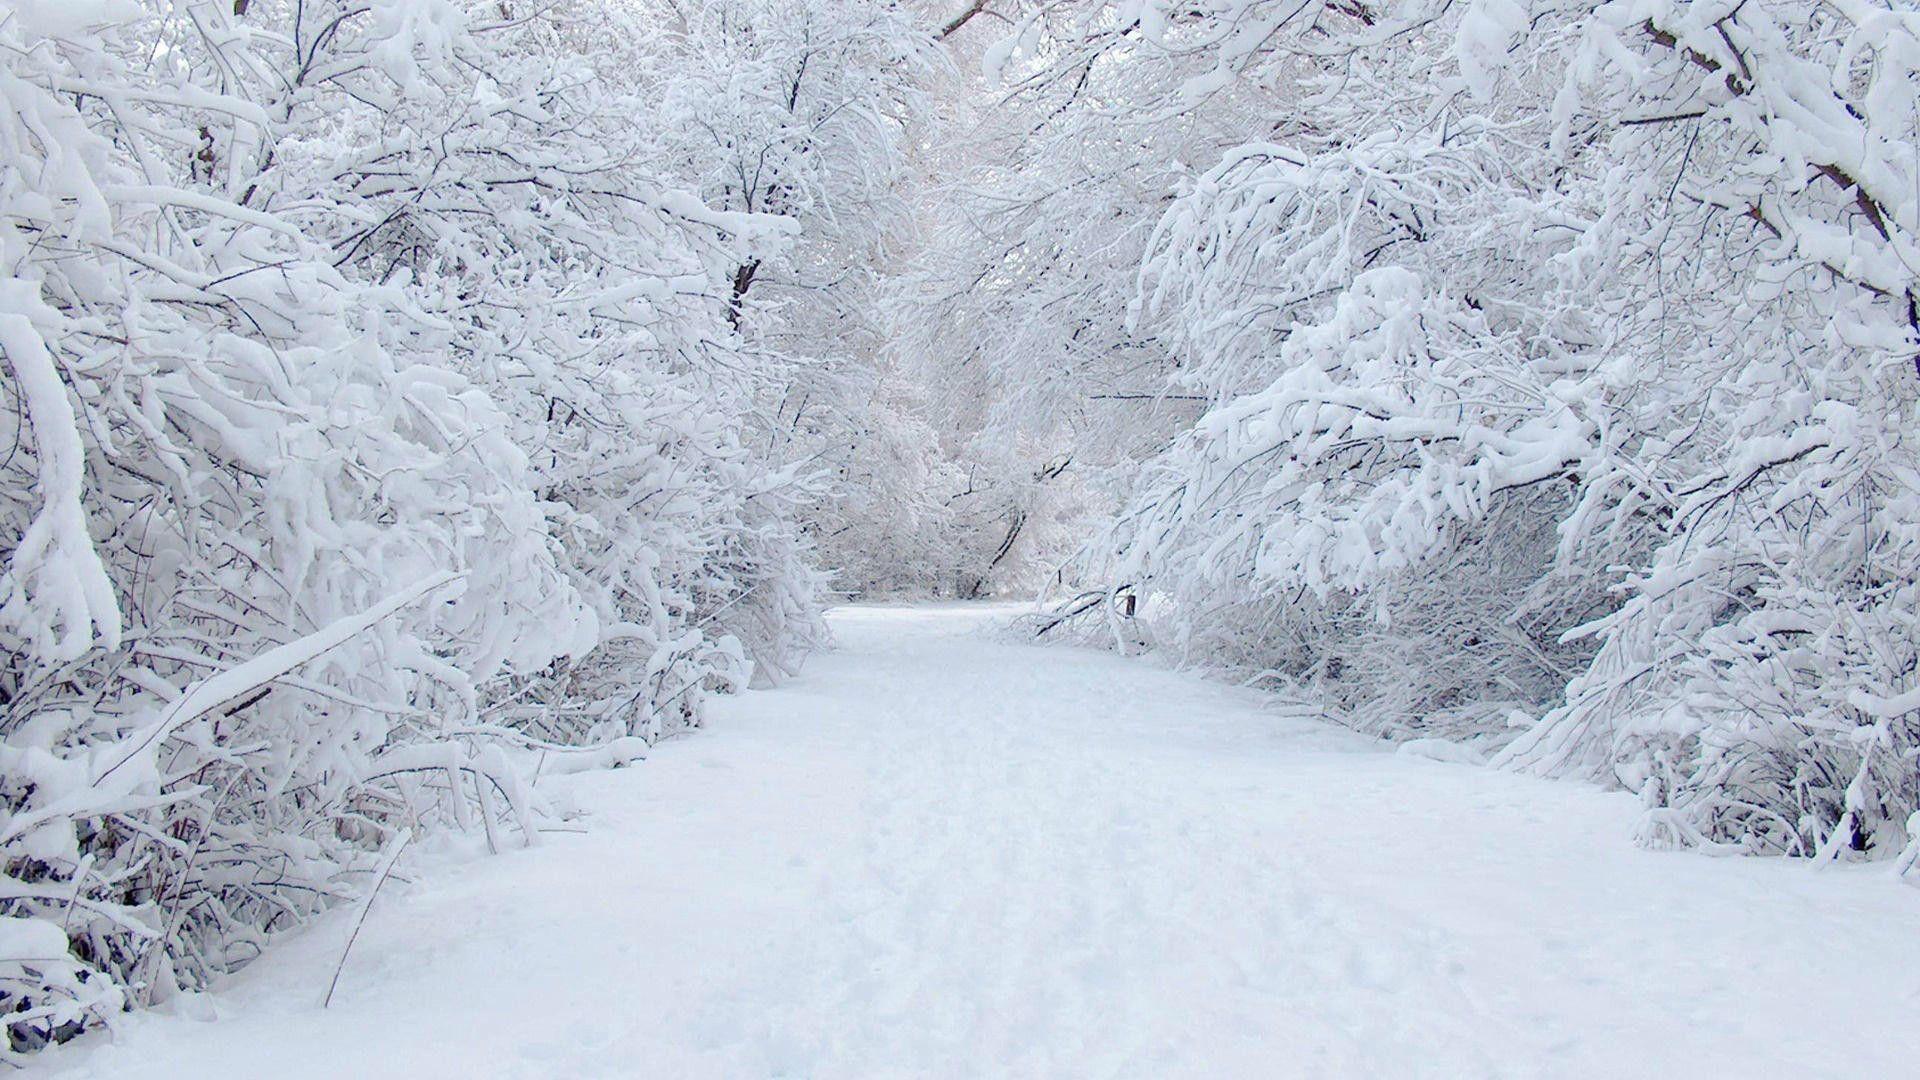 10 Latest Winter Wonderland Background Pictures Full Hd 1080p For Pc Background Winter Wonderland Background Snow Pictures Background Pictures